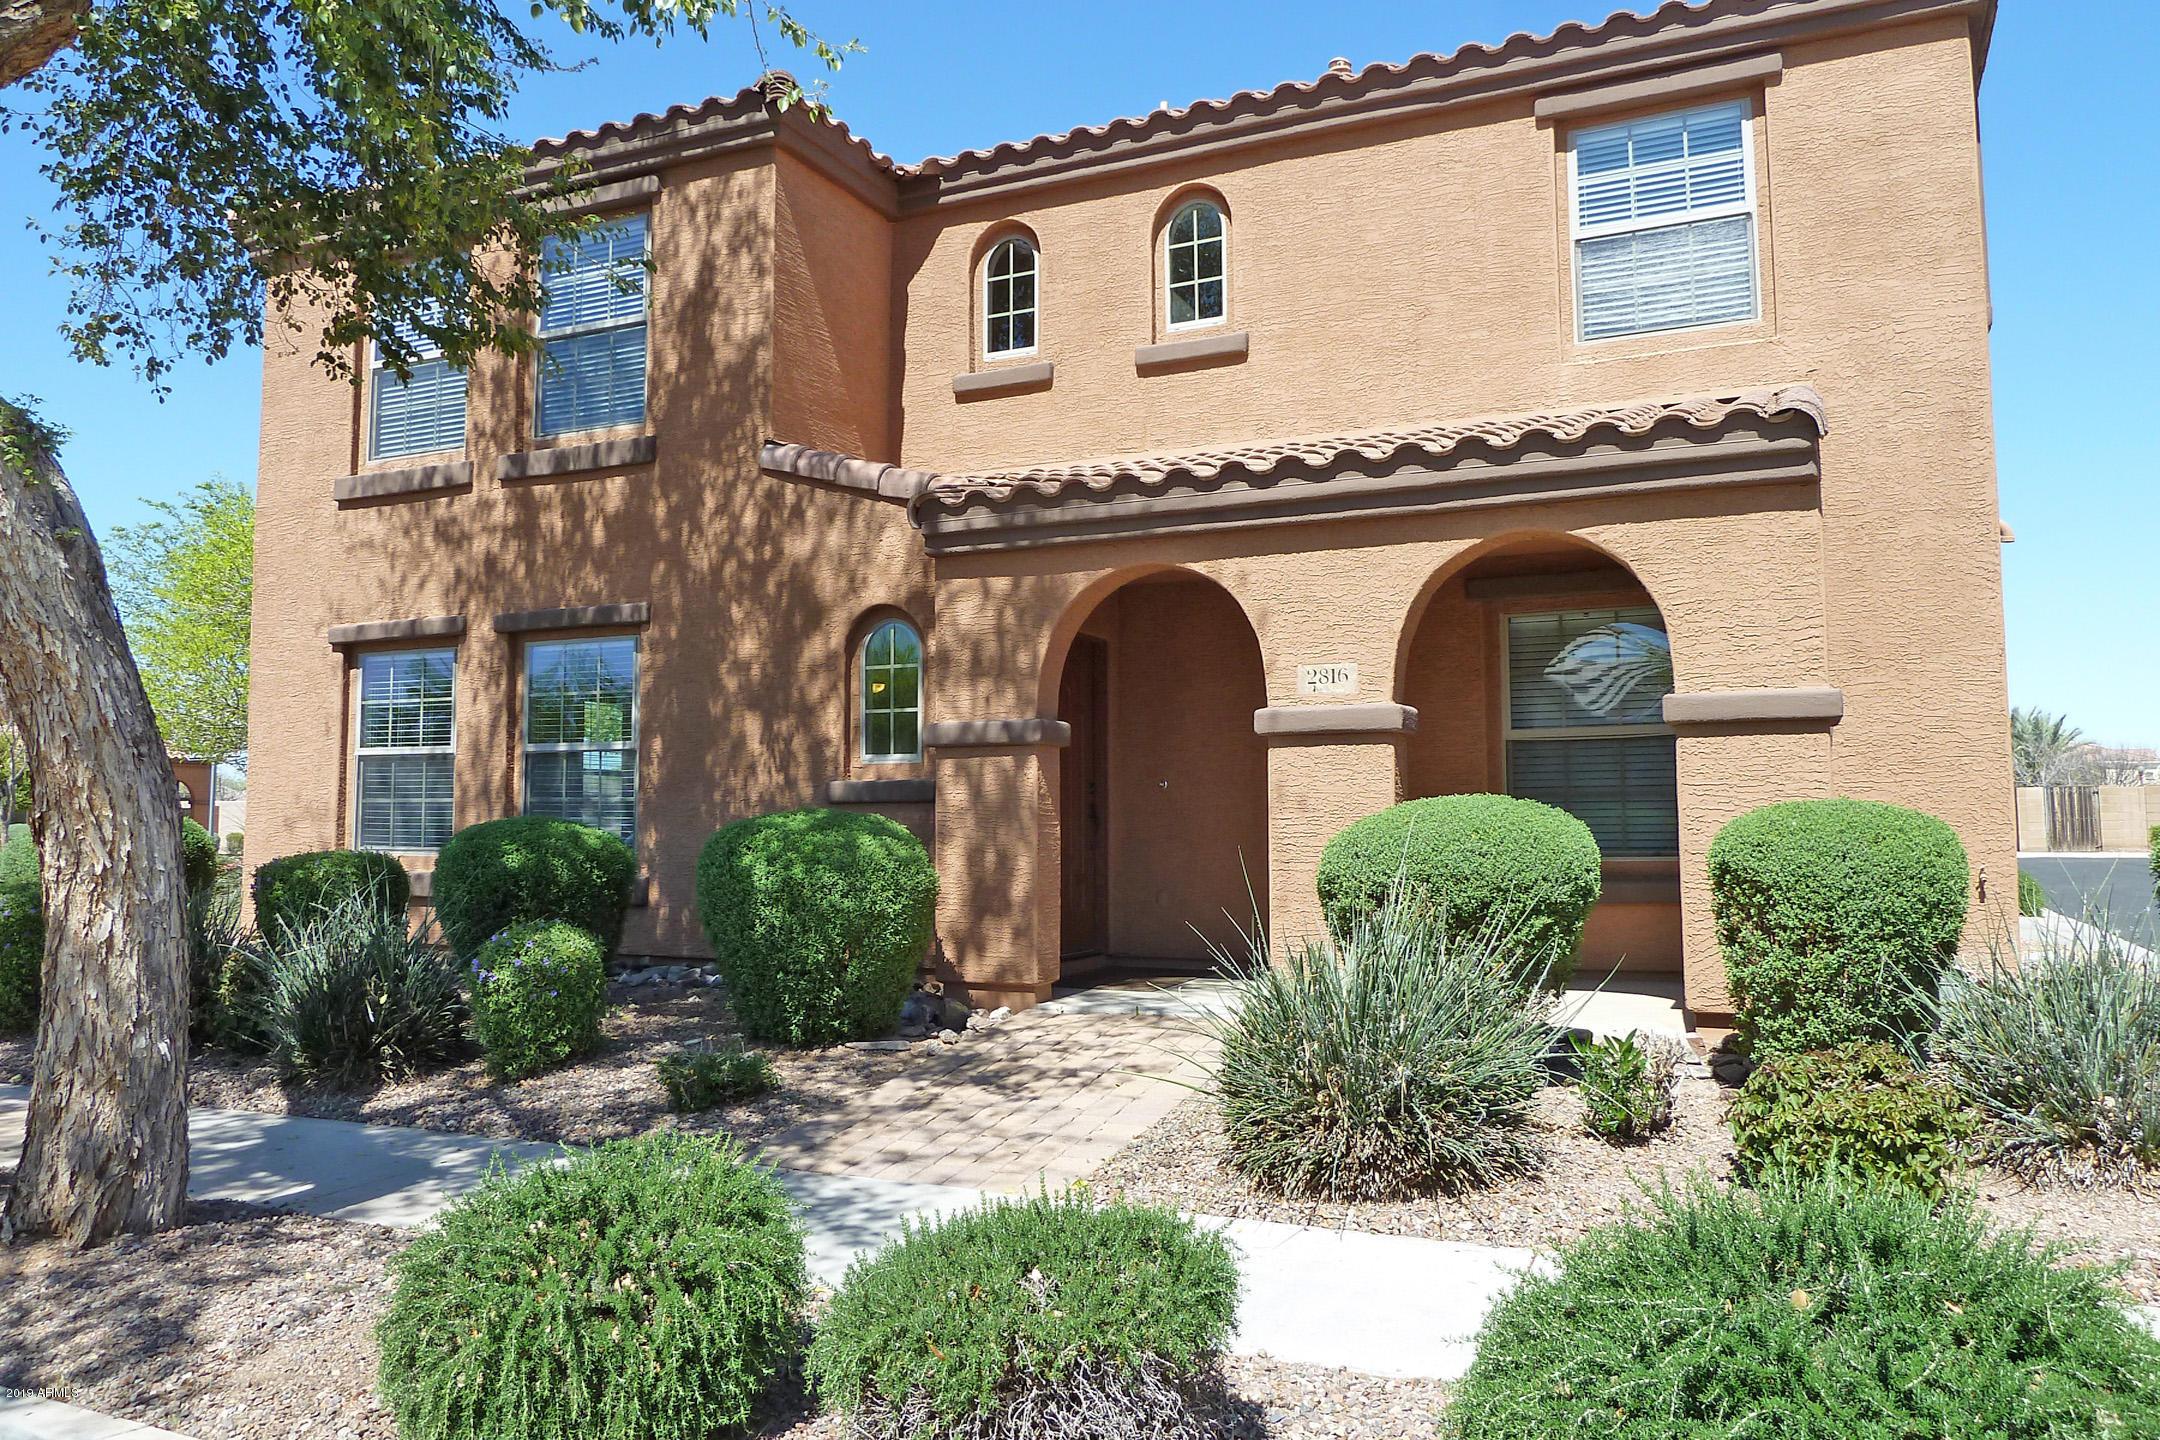 Photo for 2816 E Megan Street, Gilbert, AZ 85295 (MLS # 5900057)